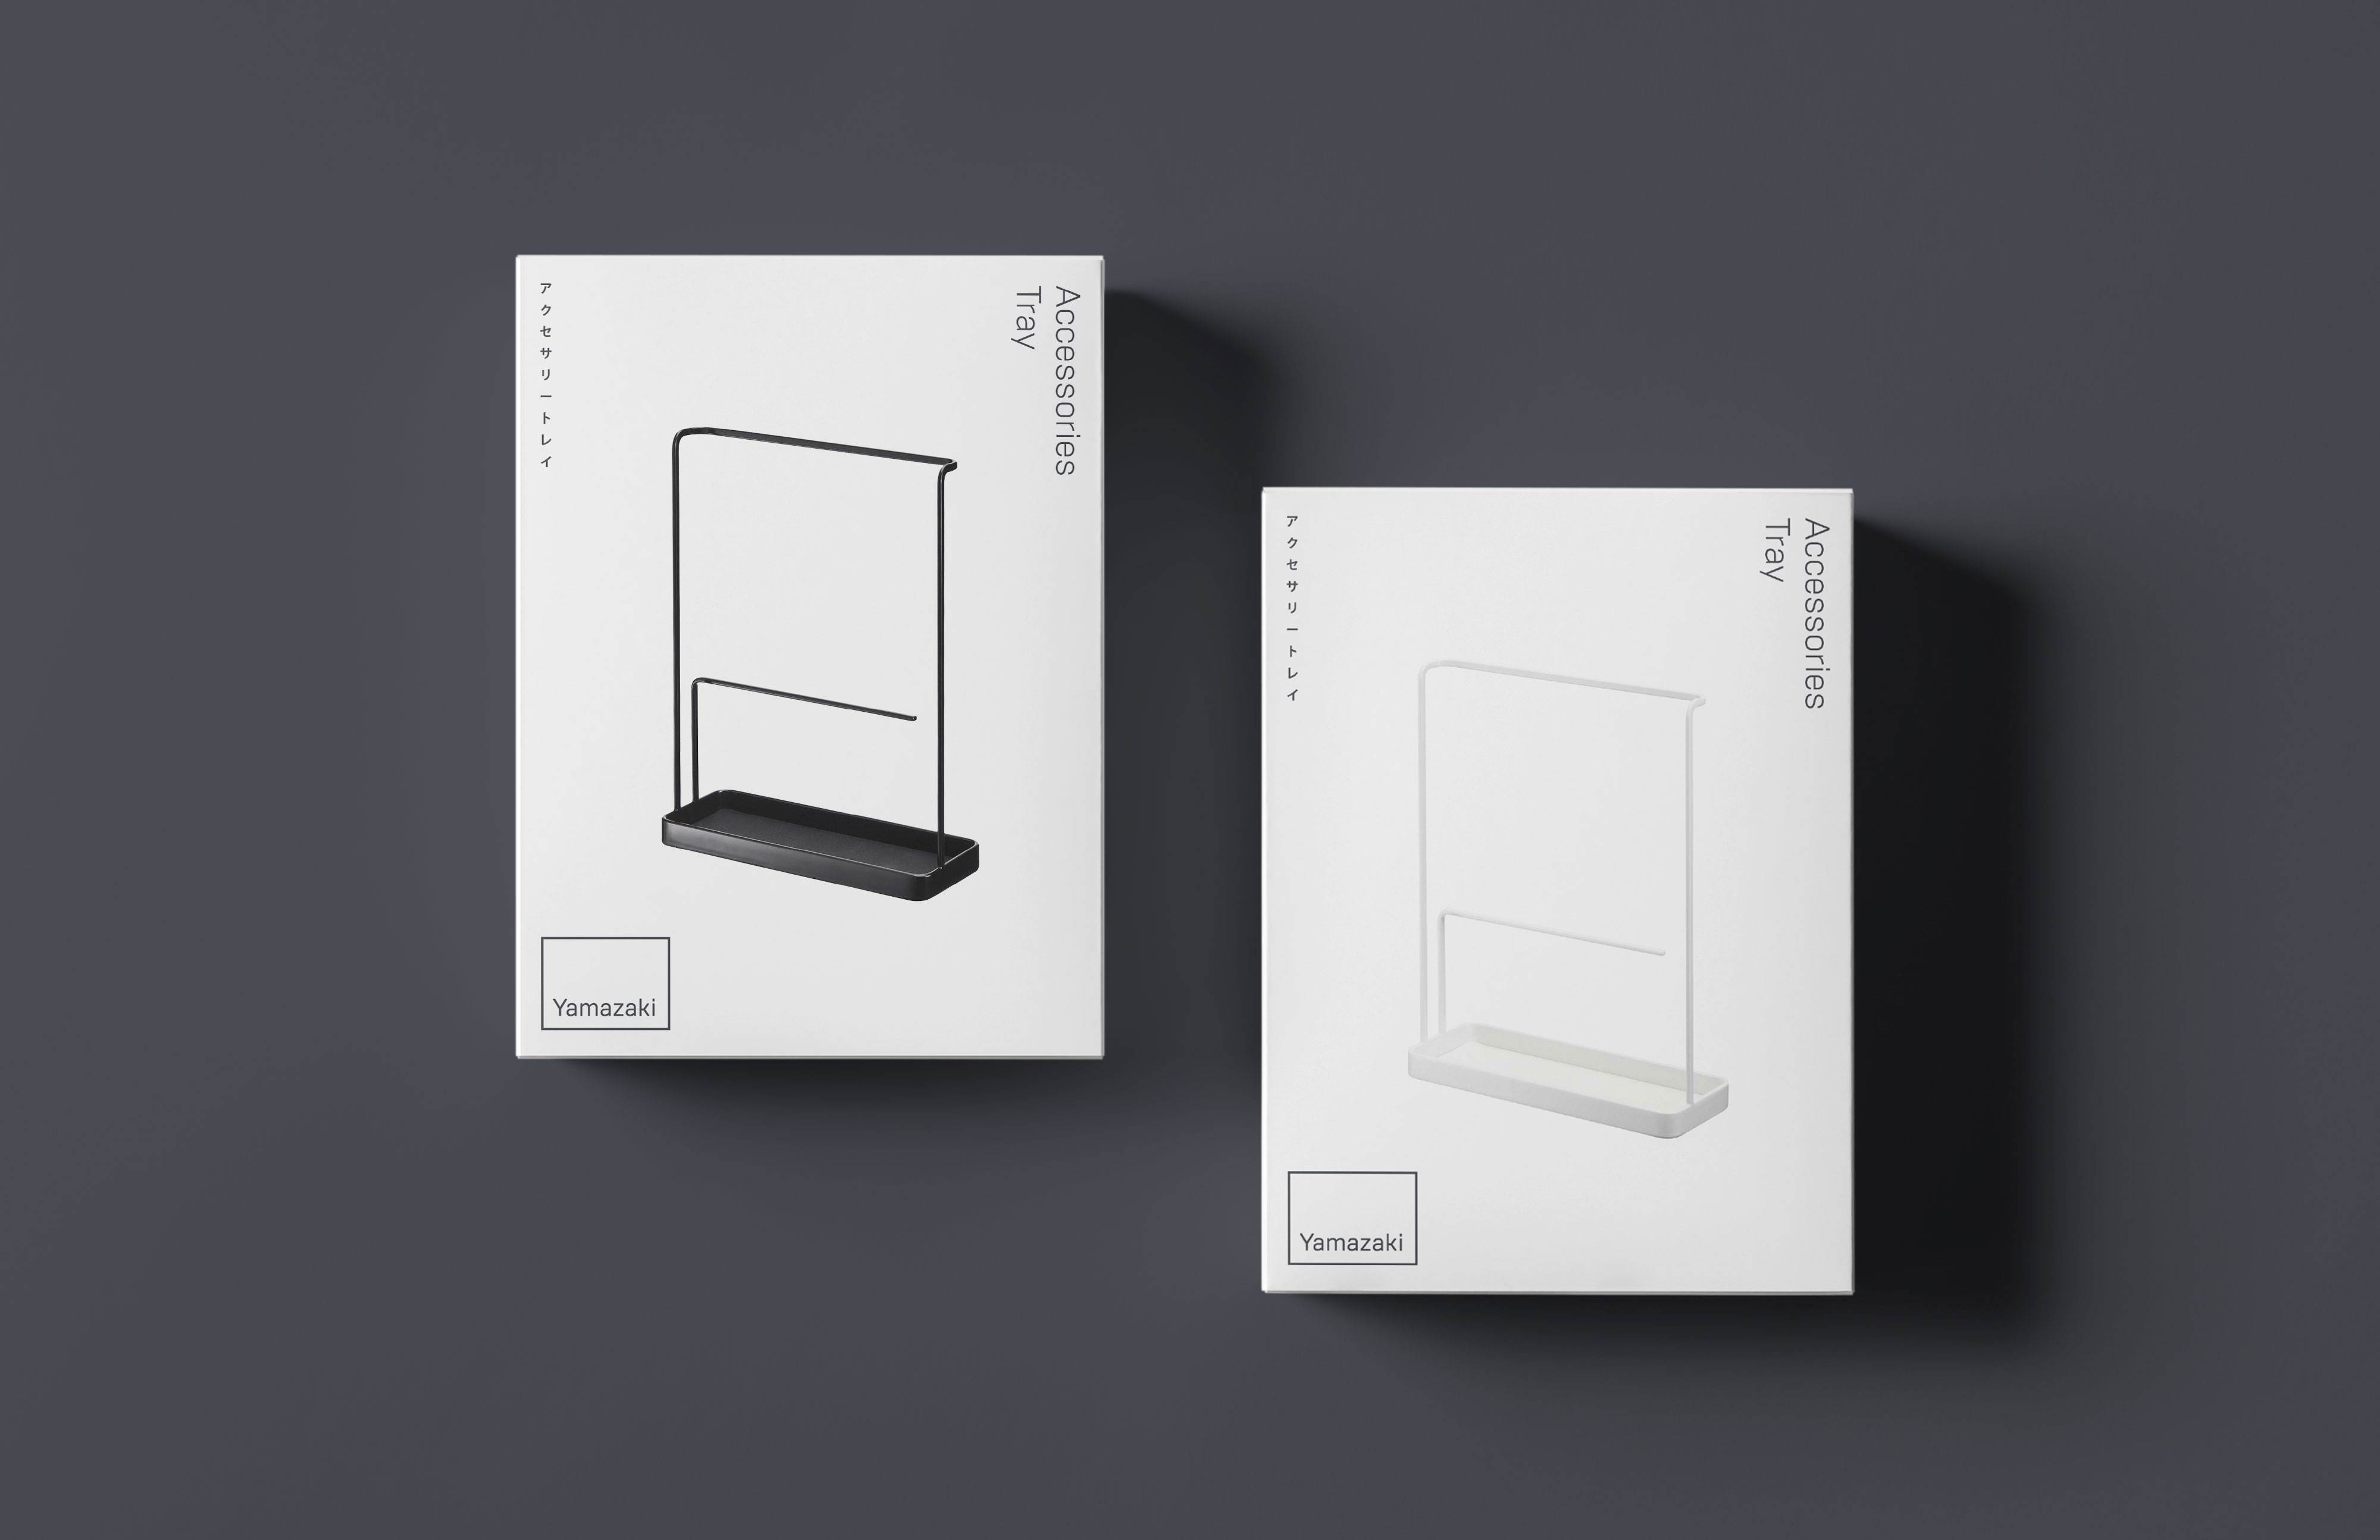 Yamazaki-Double-Box-Hero000